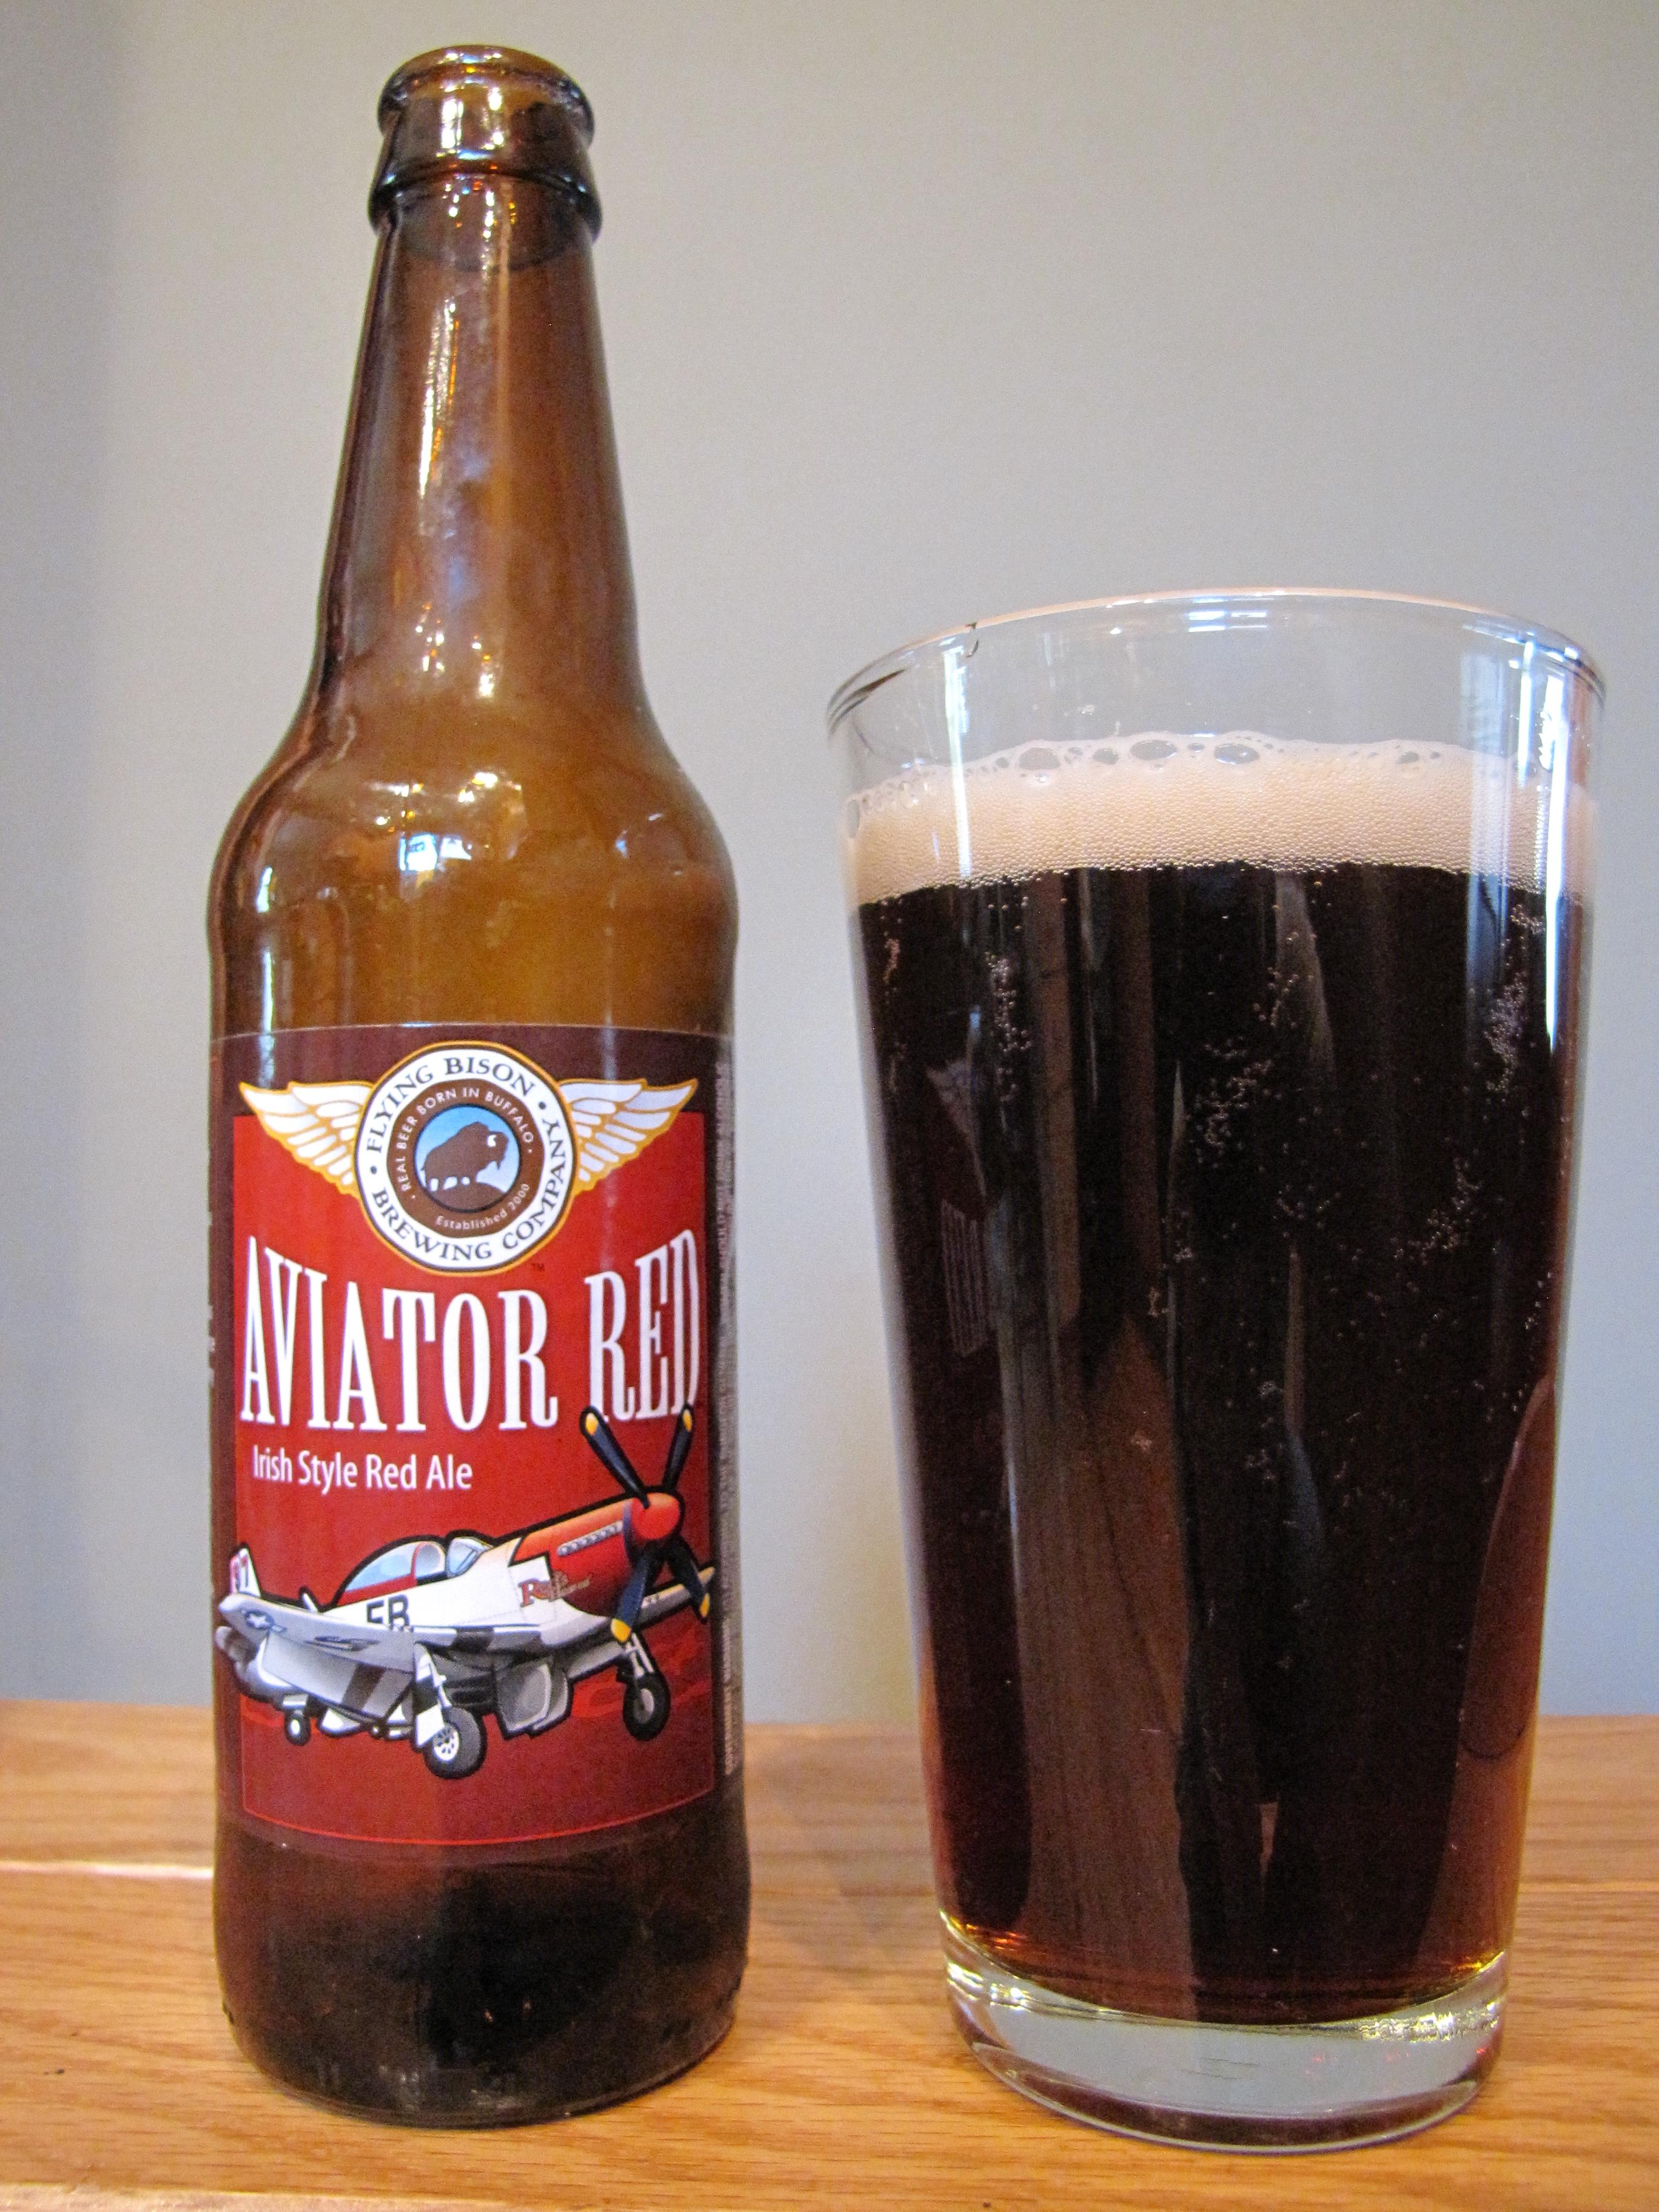 Flying Bison Aviator Red